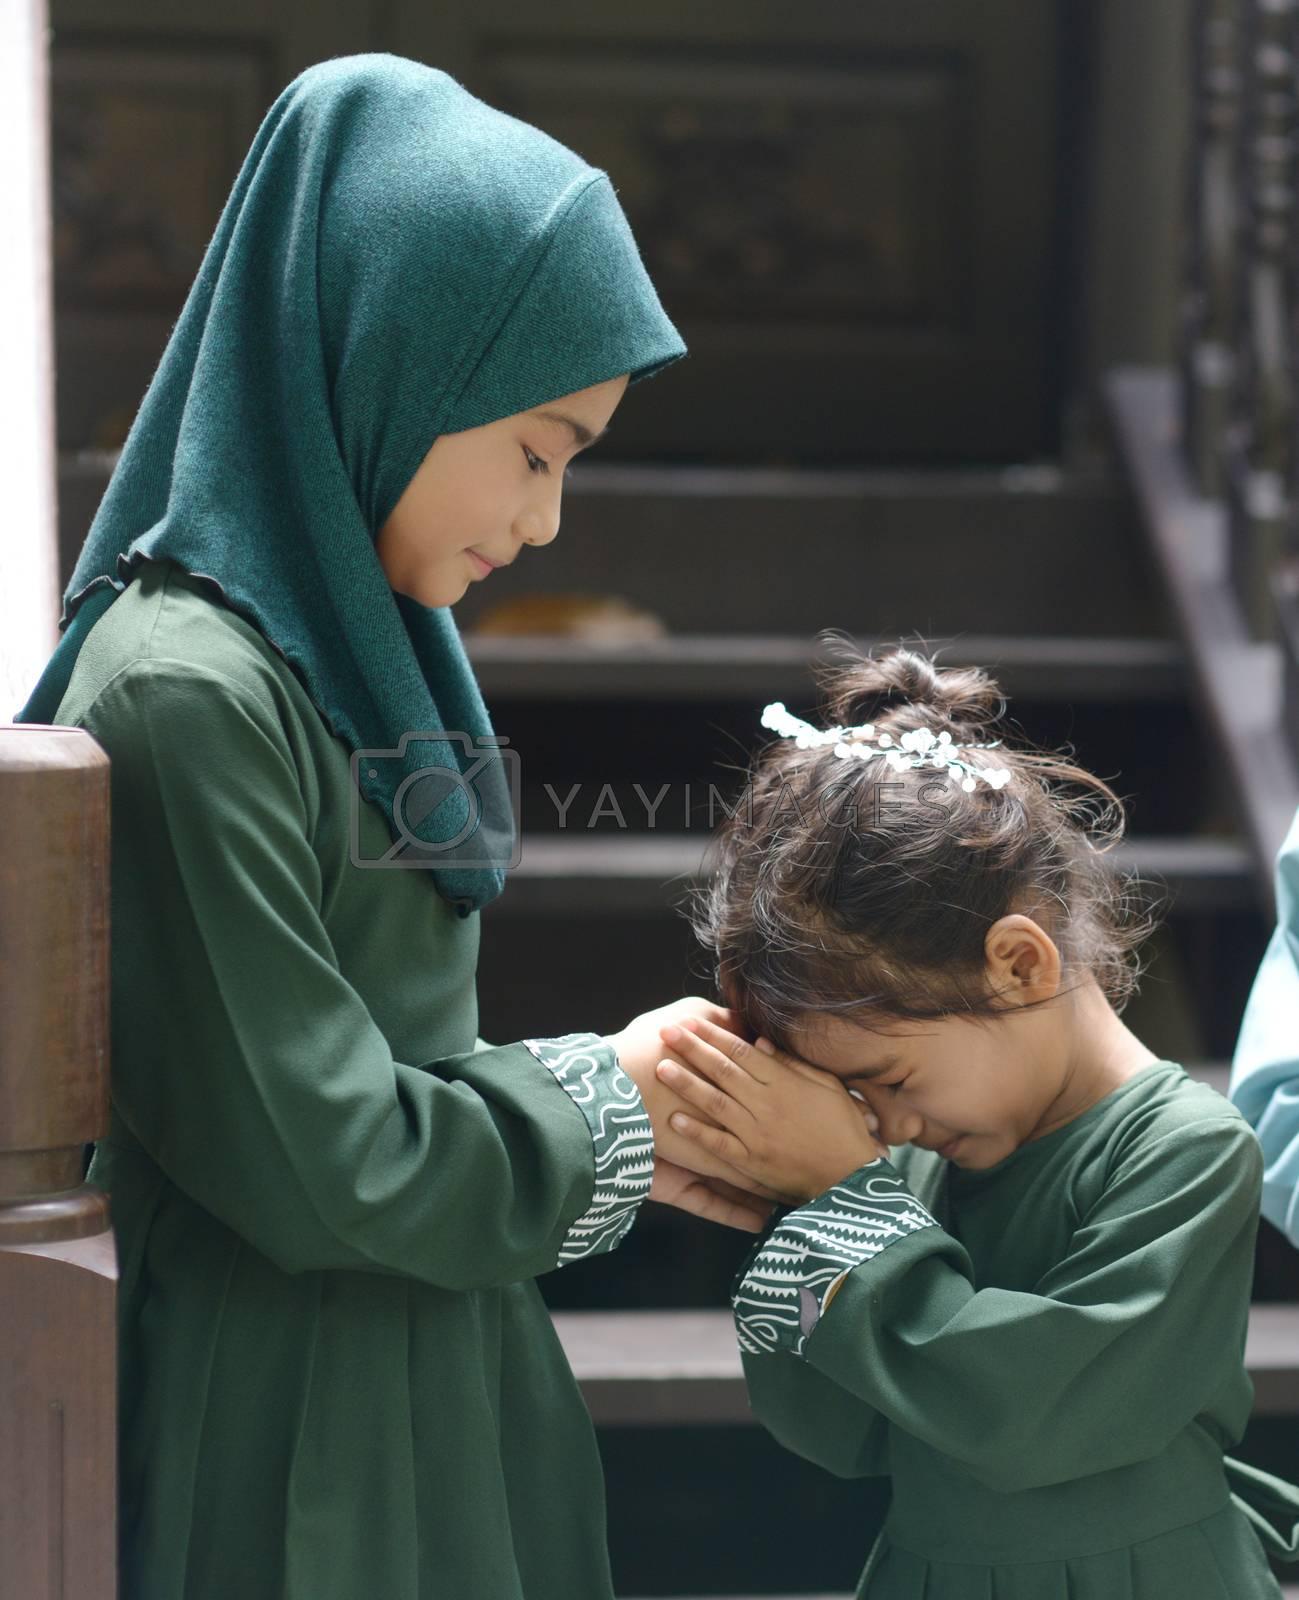 Muslim children greeting, Hari Raya Eid Al-Fitr concept.